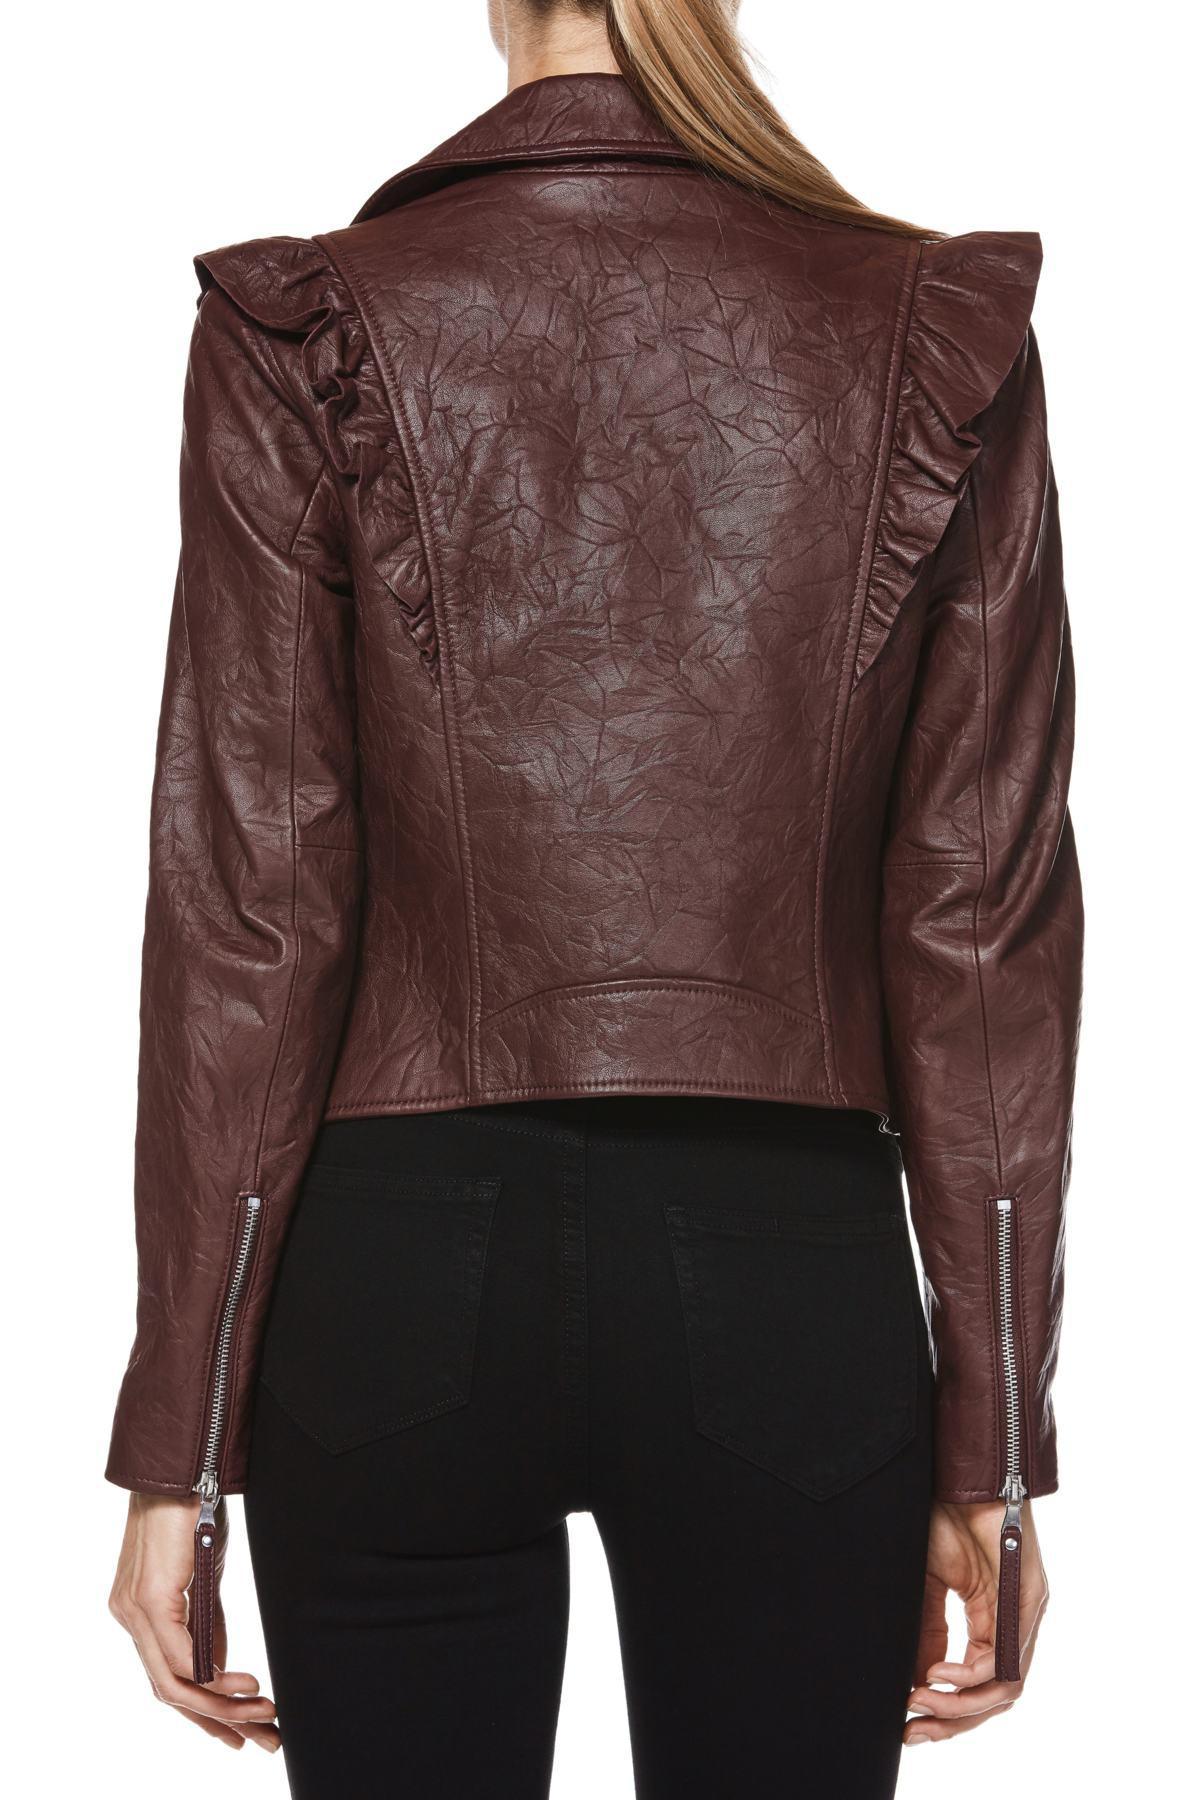 b5728b62c561 PAIGE - Brown Annika Leather Moto Jacket - Lyst. View fullscreen